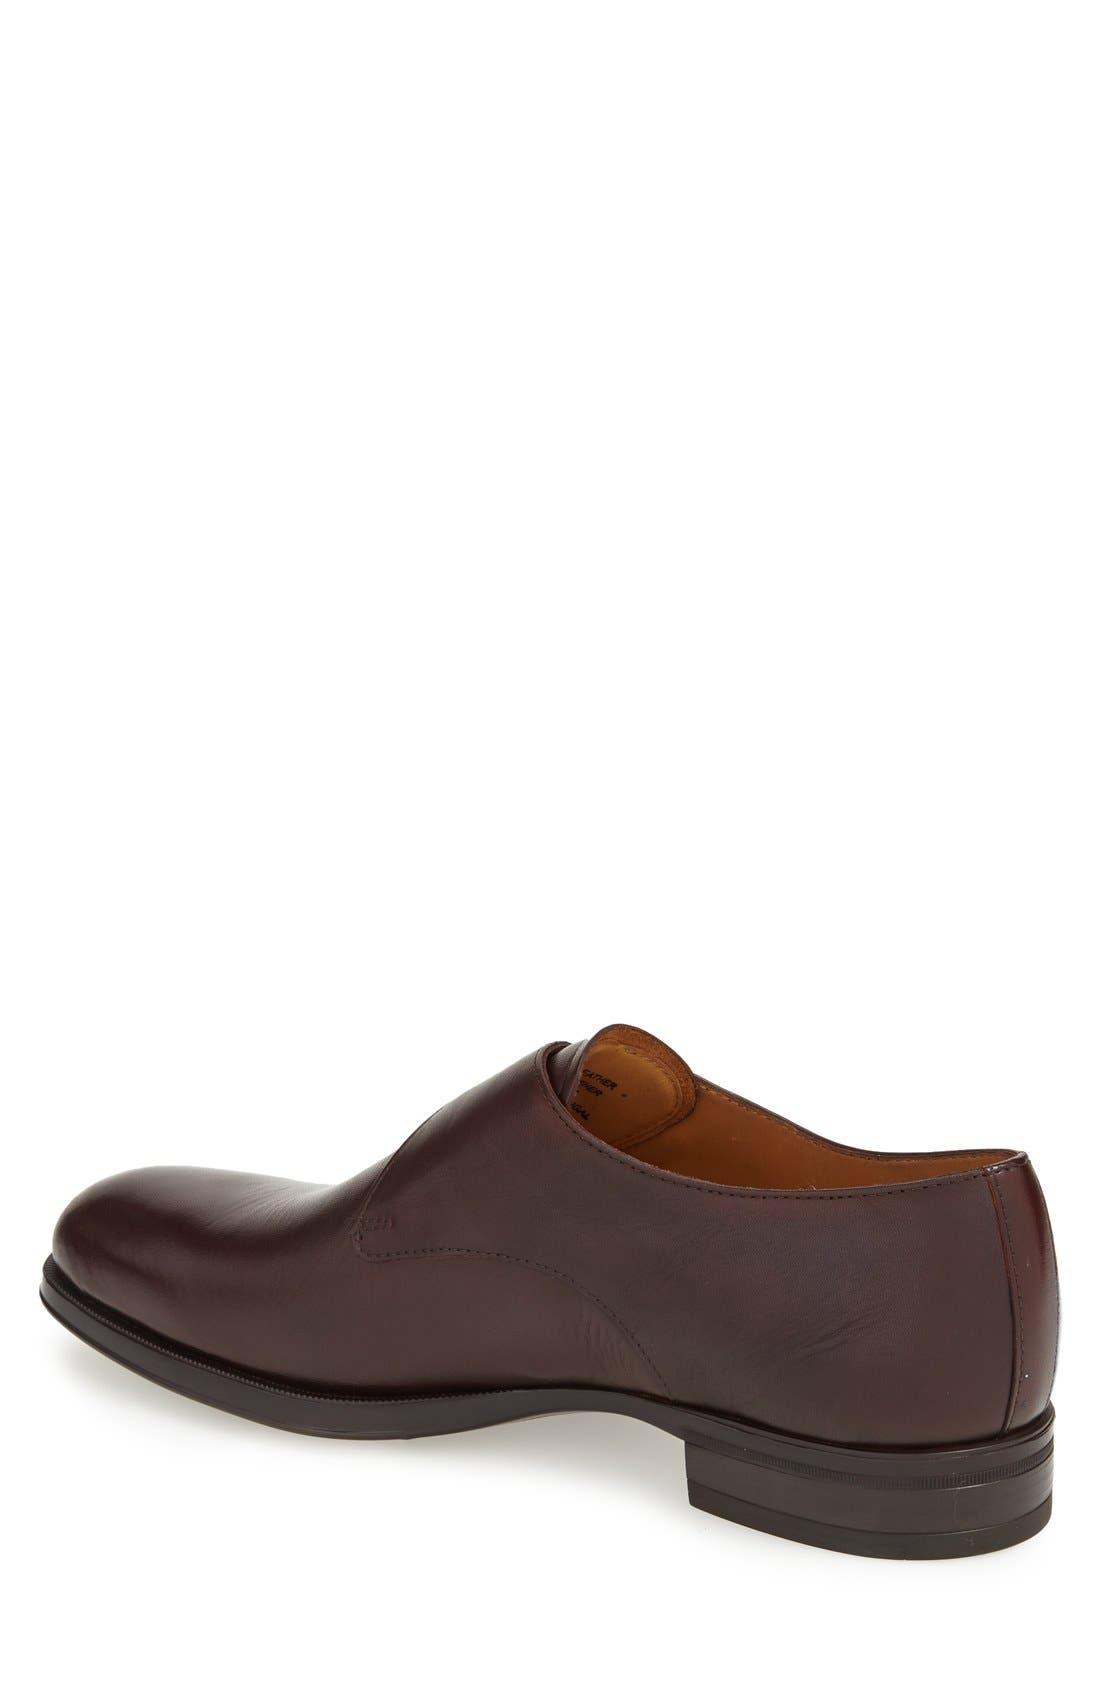 VINCE CAMUTO,                             'Trifolo' Monk Strap Shoe,                             Alternate thumbnail 2, color,                             DARK WOODBURY LEATHER